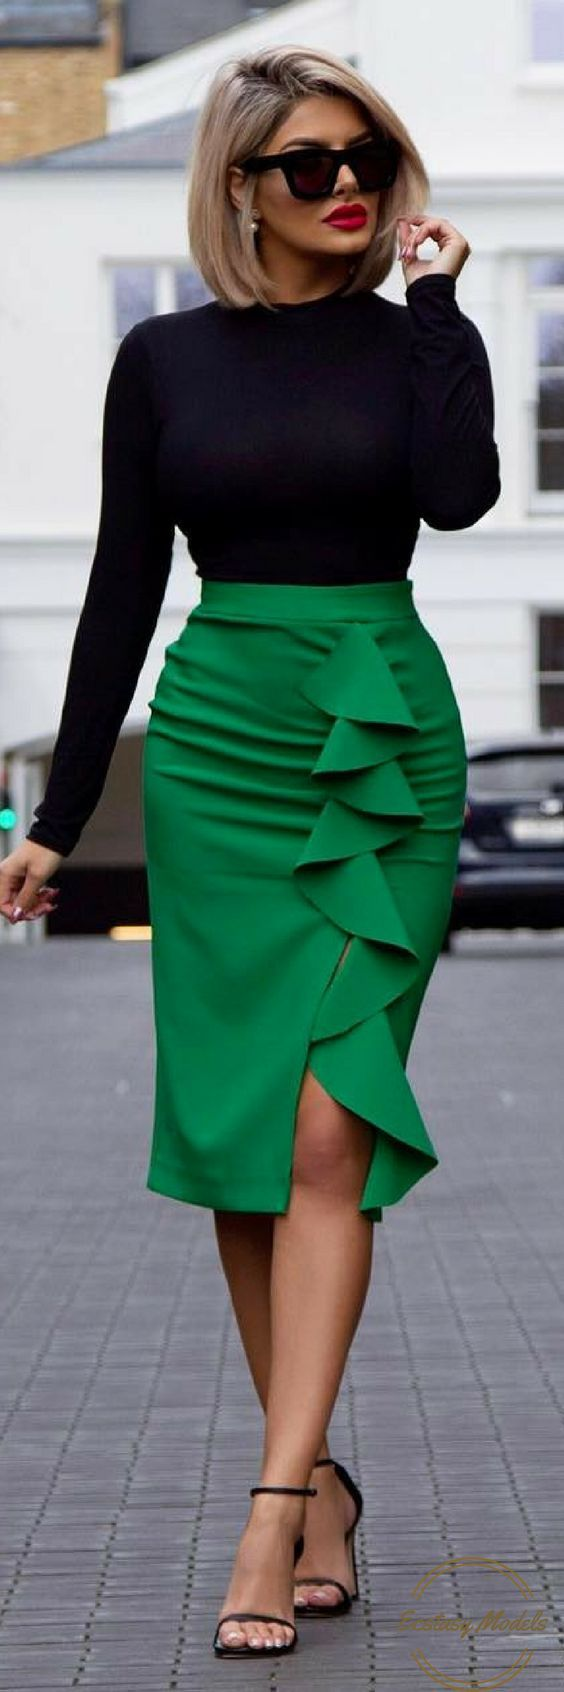 96680bae2 Falda tubo verde esmeralda, con buso manga larga nego | Wear | Moda ...